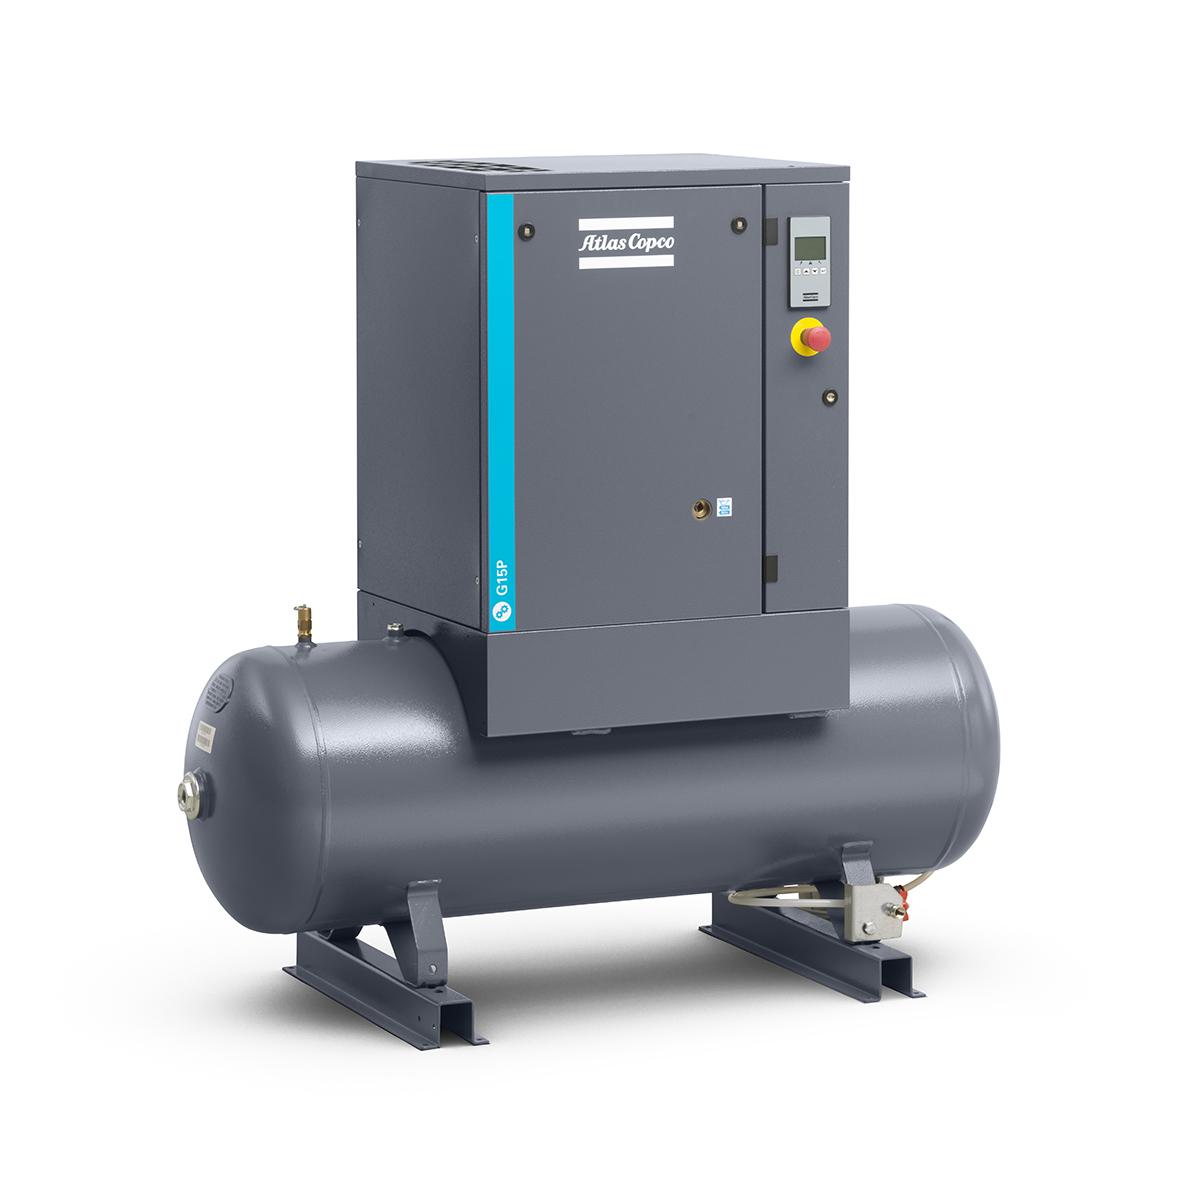 Screw Air Compressor - Model 15kW Screw Compressor G15P 10 BAR